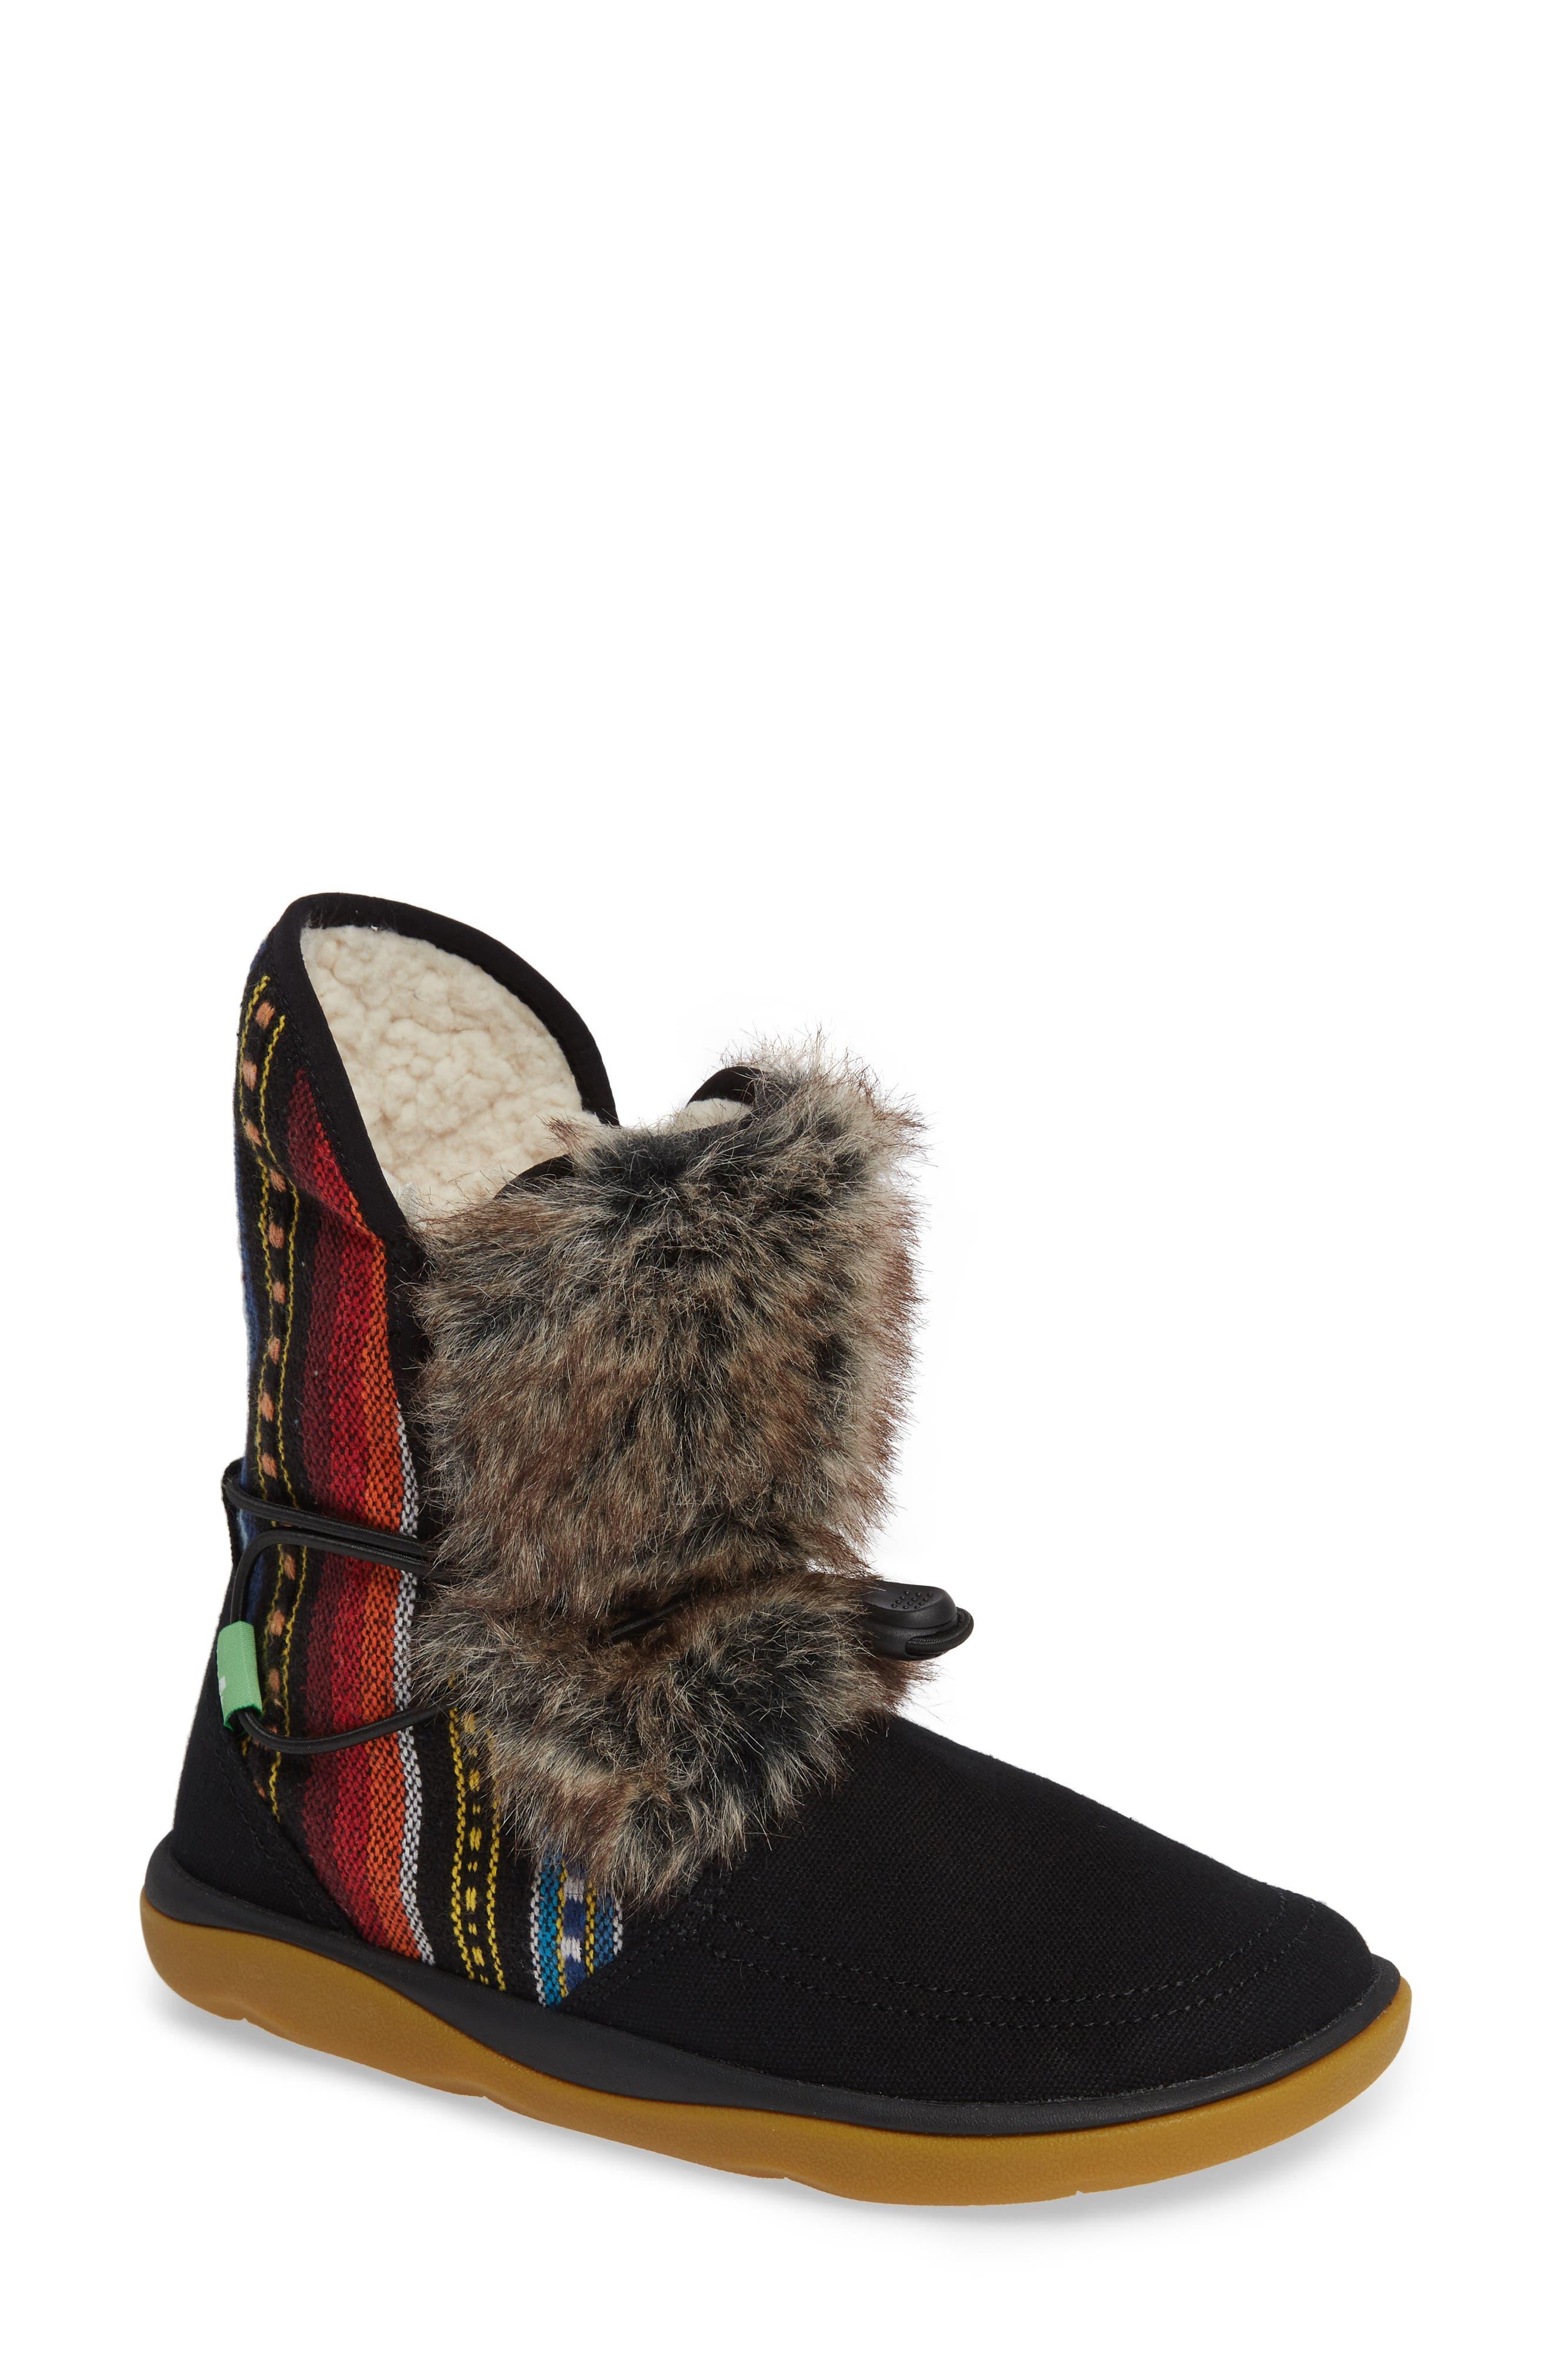 SANUK, Tripper Flurry Faux Fur Boot, Main thumbnail 1, color, BLACK